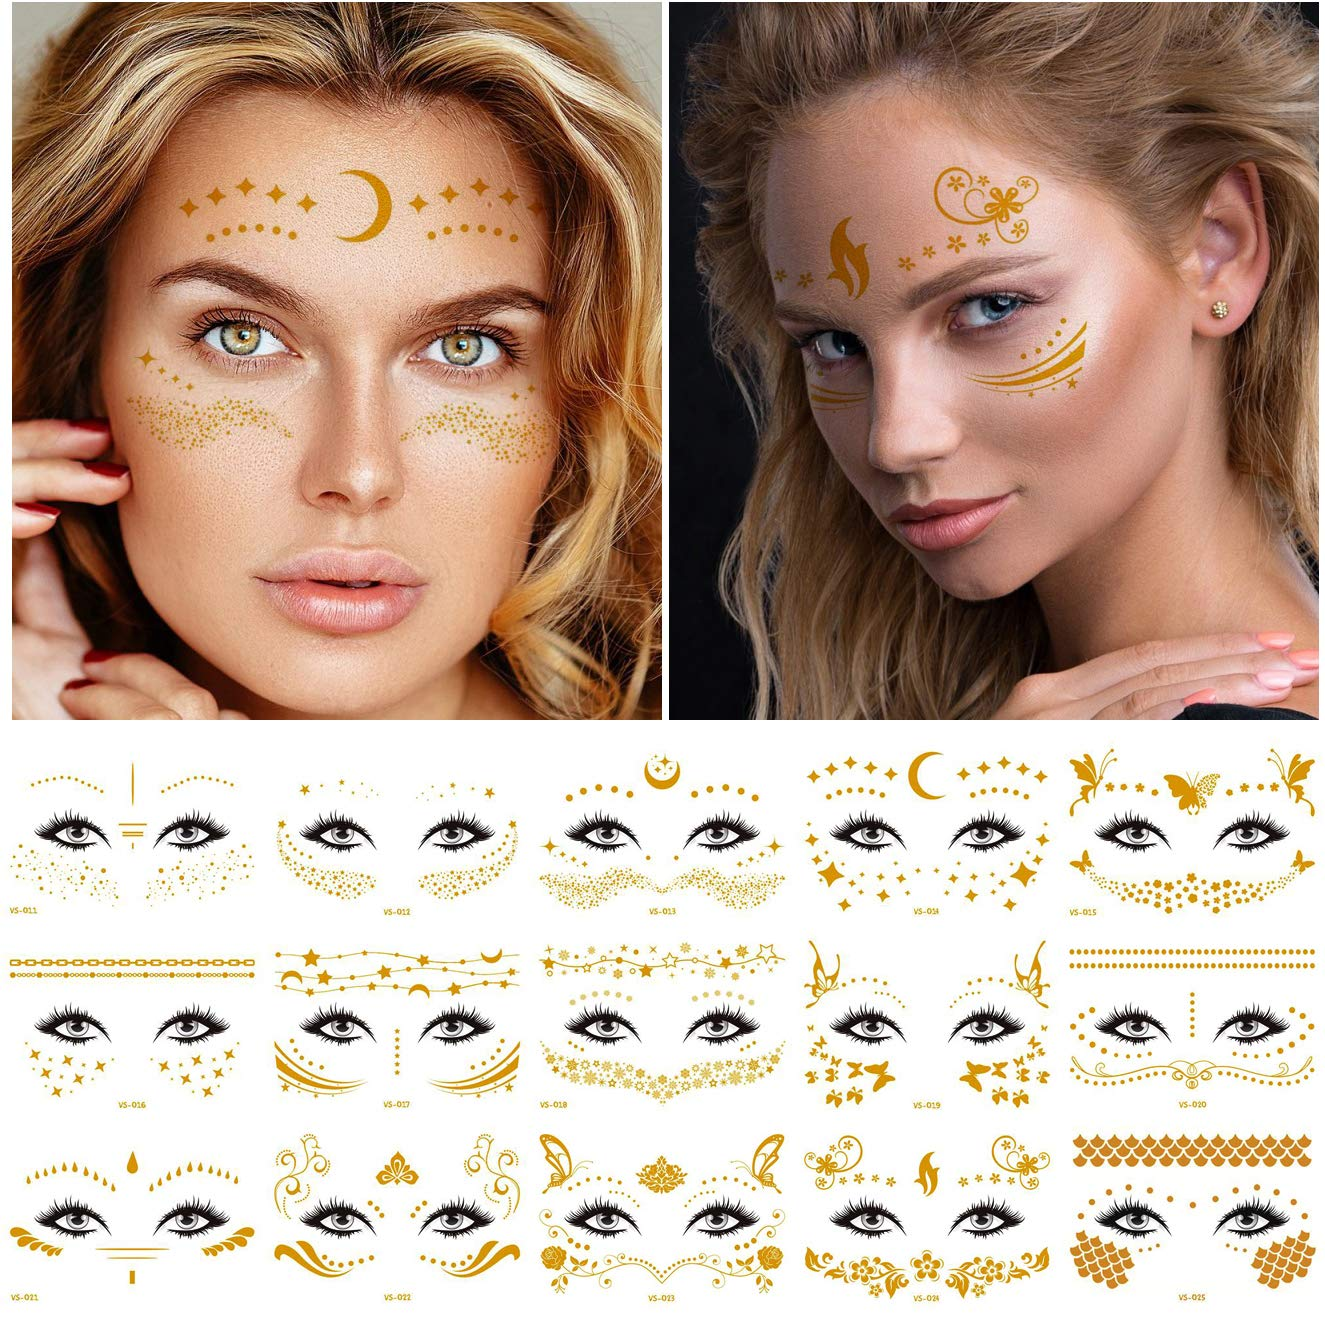 Kotbs 15 Sheets Gold Metallic Temporary Tattoos Sticker Gold Shiny Temporary Face Tattoo Stickers for Women Girls Festive Rave Make Up Dancer Costume Parties